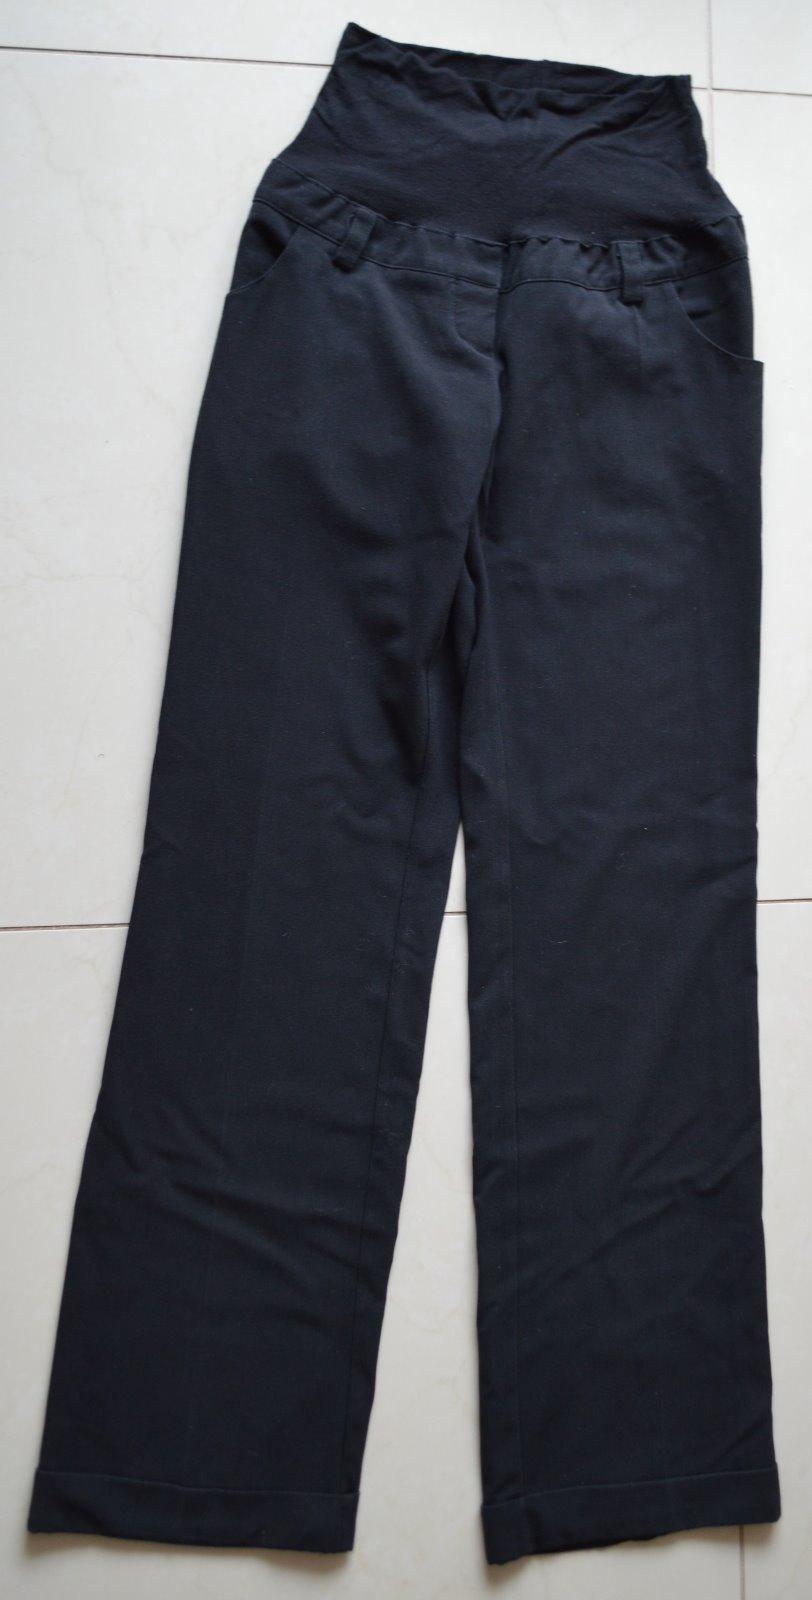 b9a615b8cc Čierne tehotenské nohavice zn. ma-ma